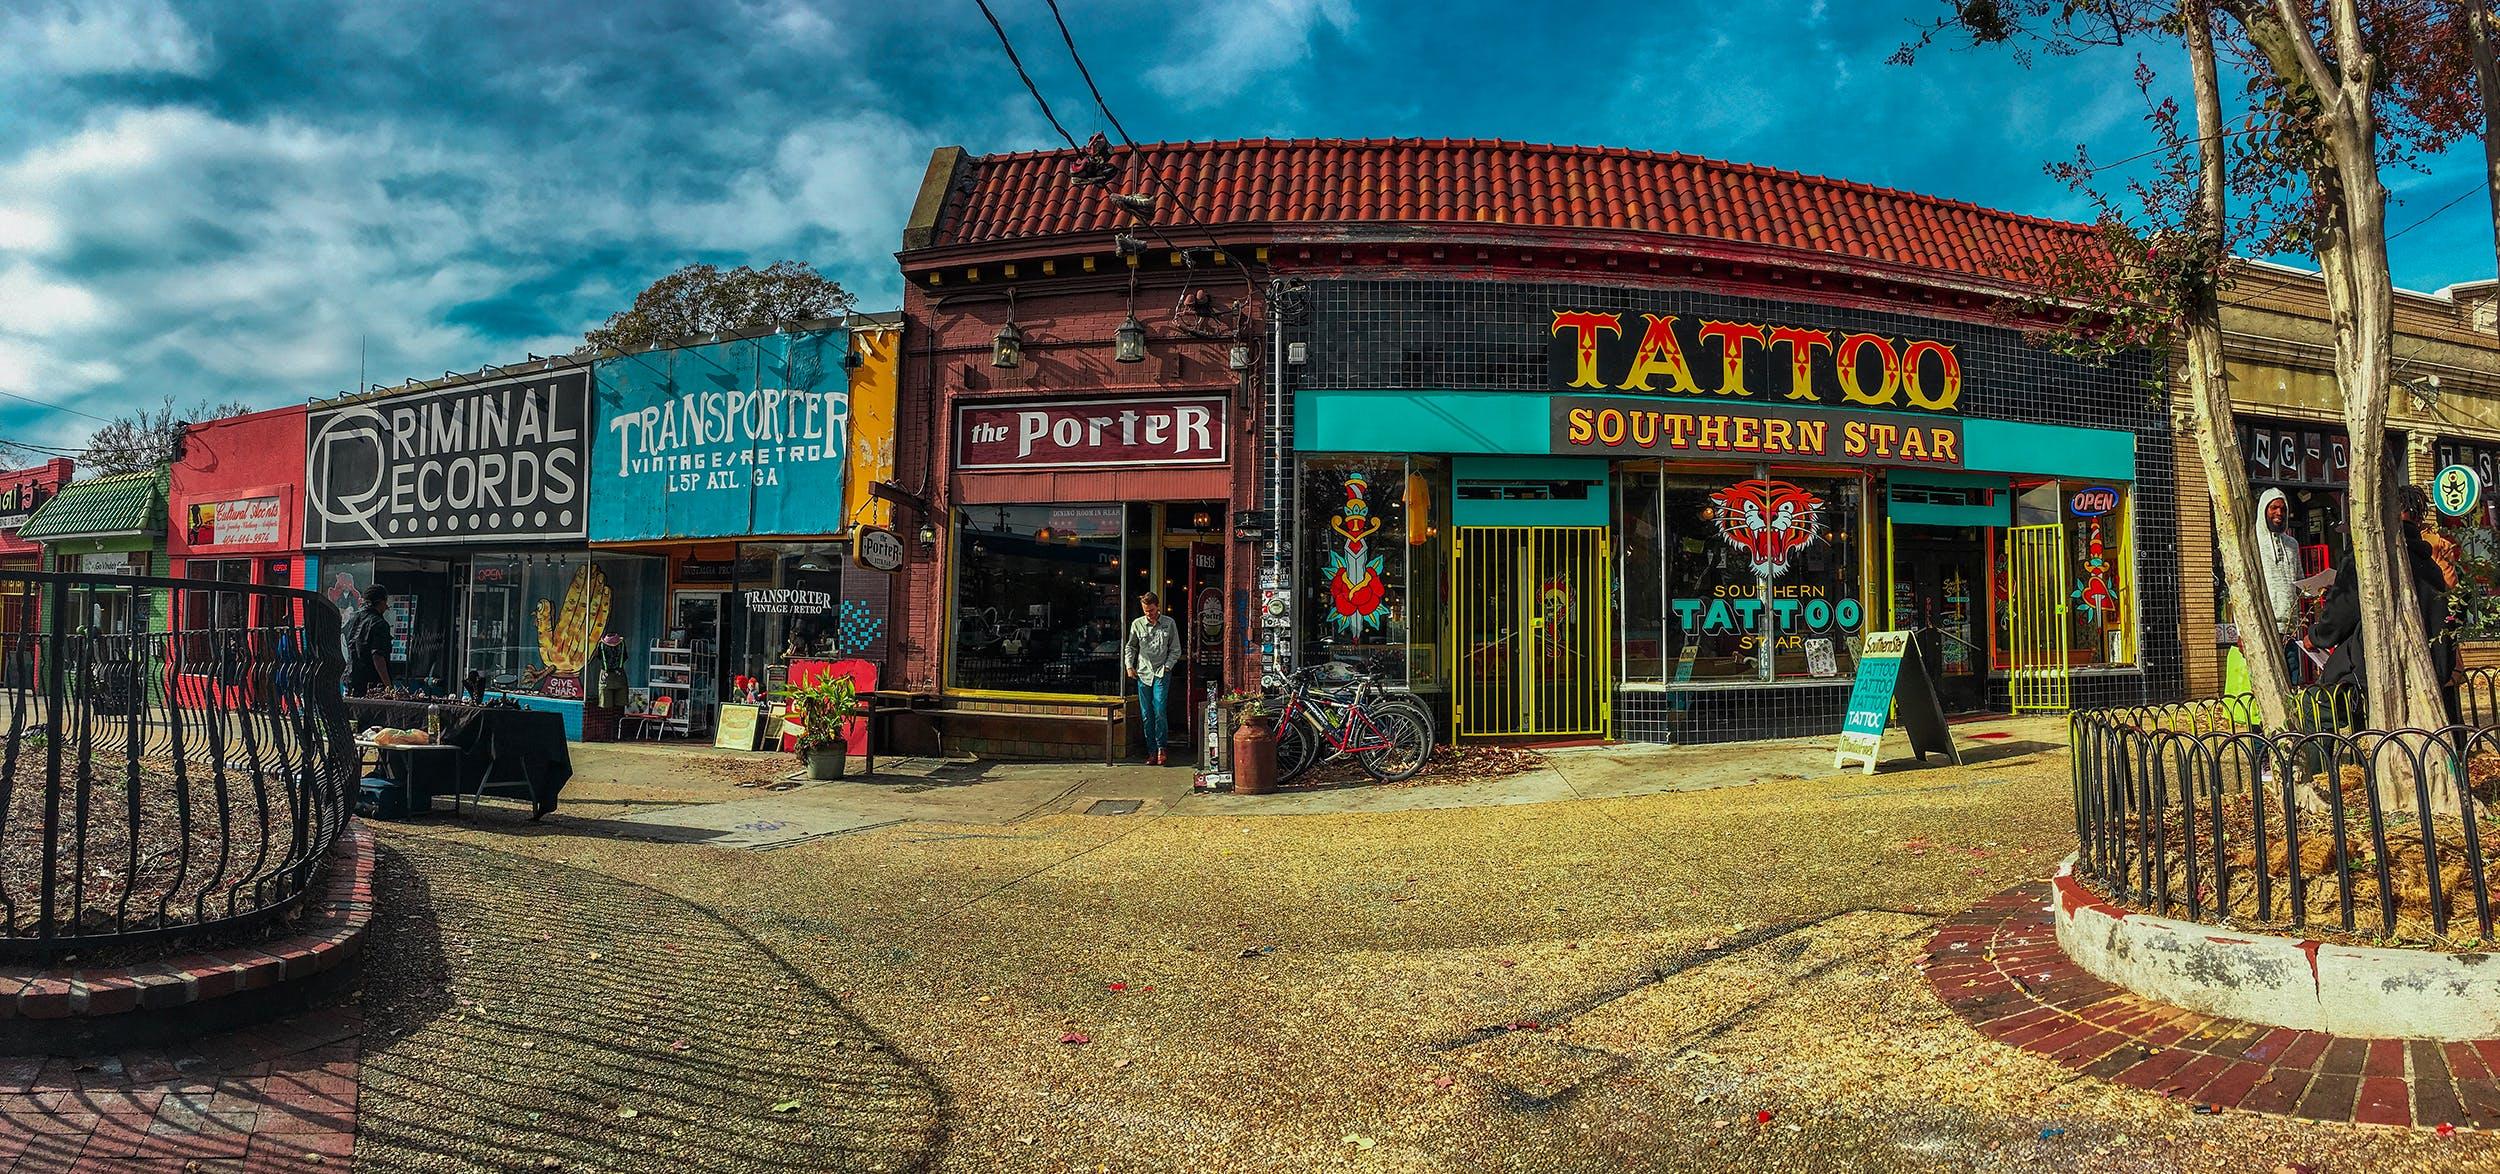 Free stock photo of sidewalk, vintage, shops, blue sky